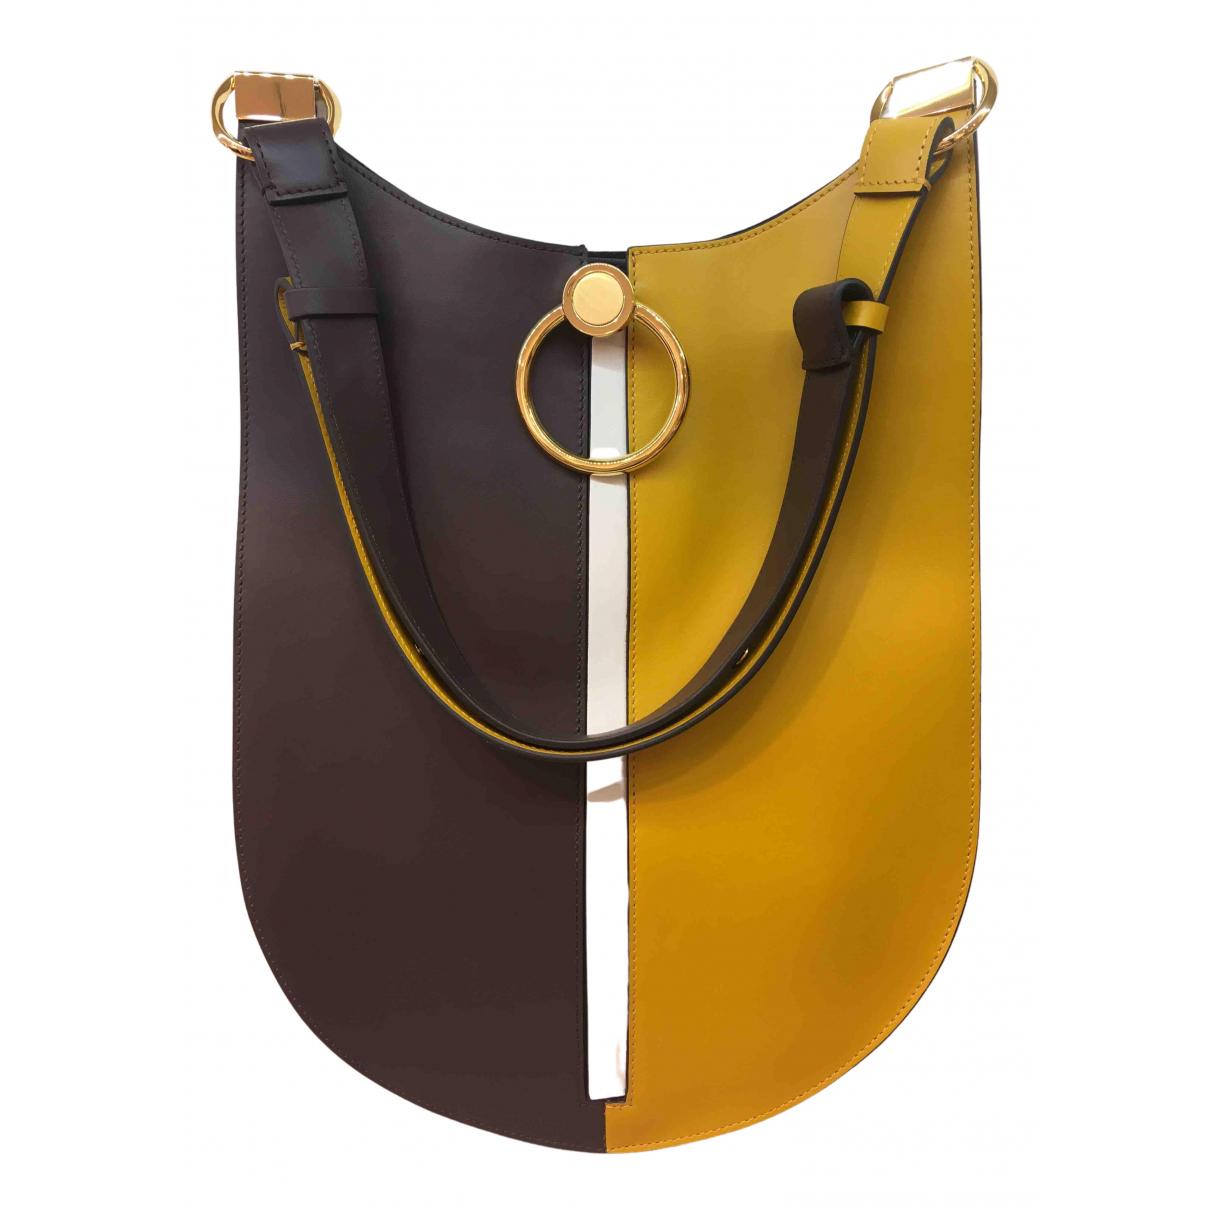 Marni Earring Handtasche in  Bunt Leder